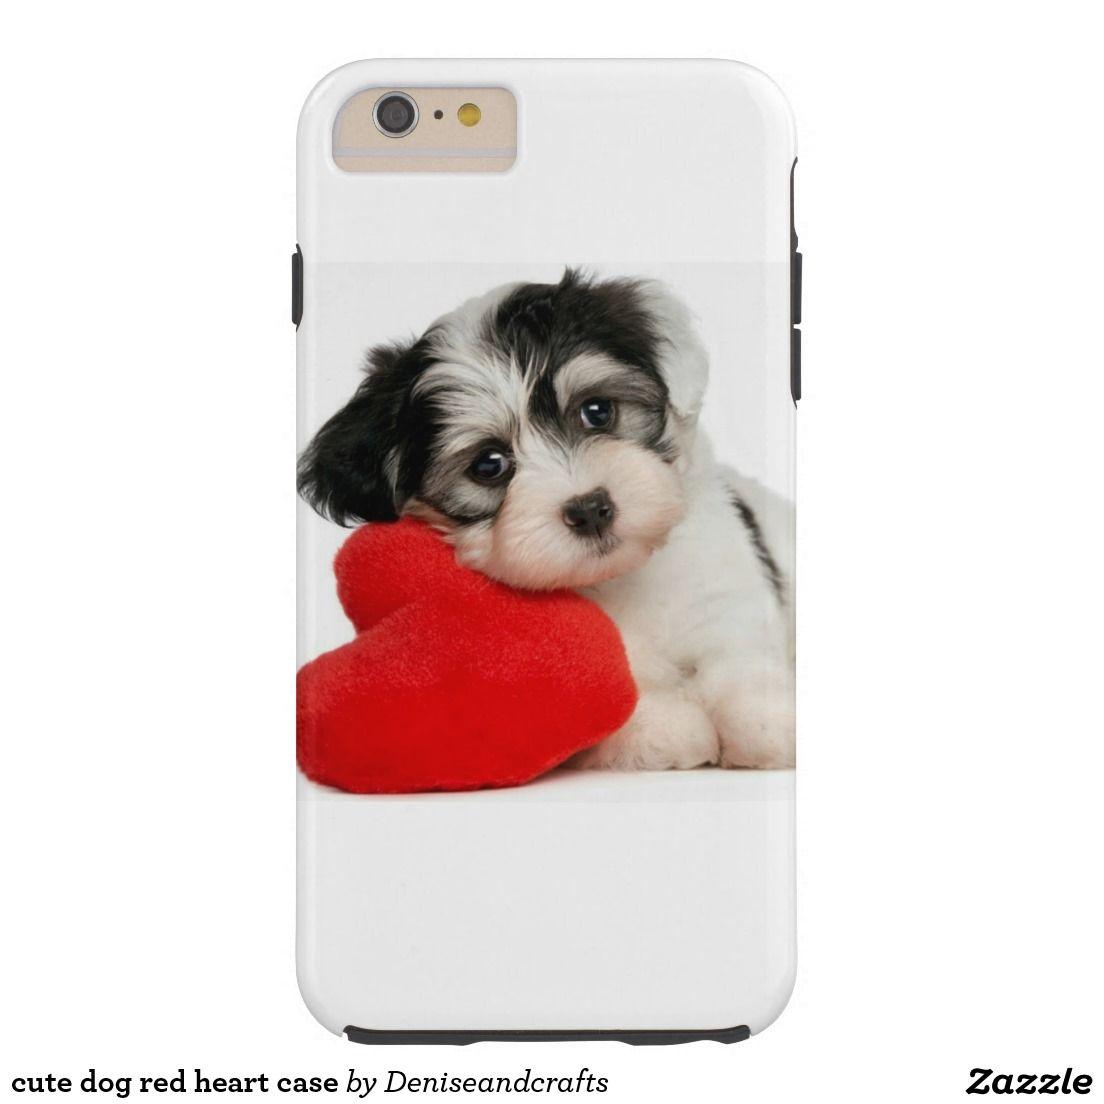 cute dog red heart case